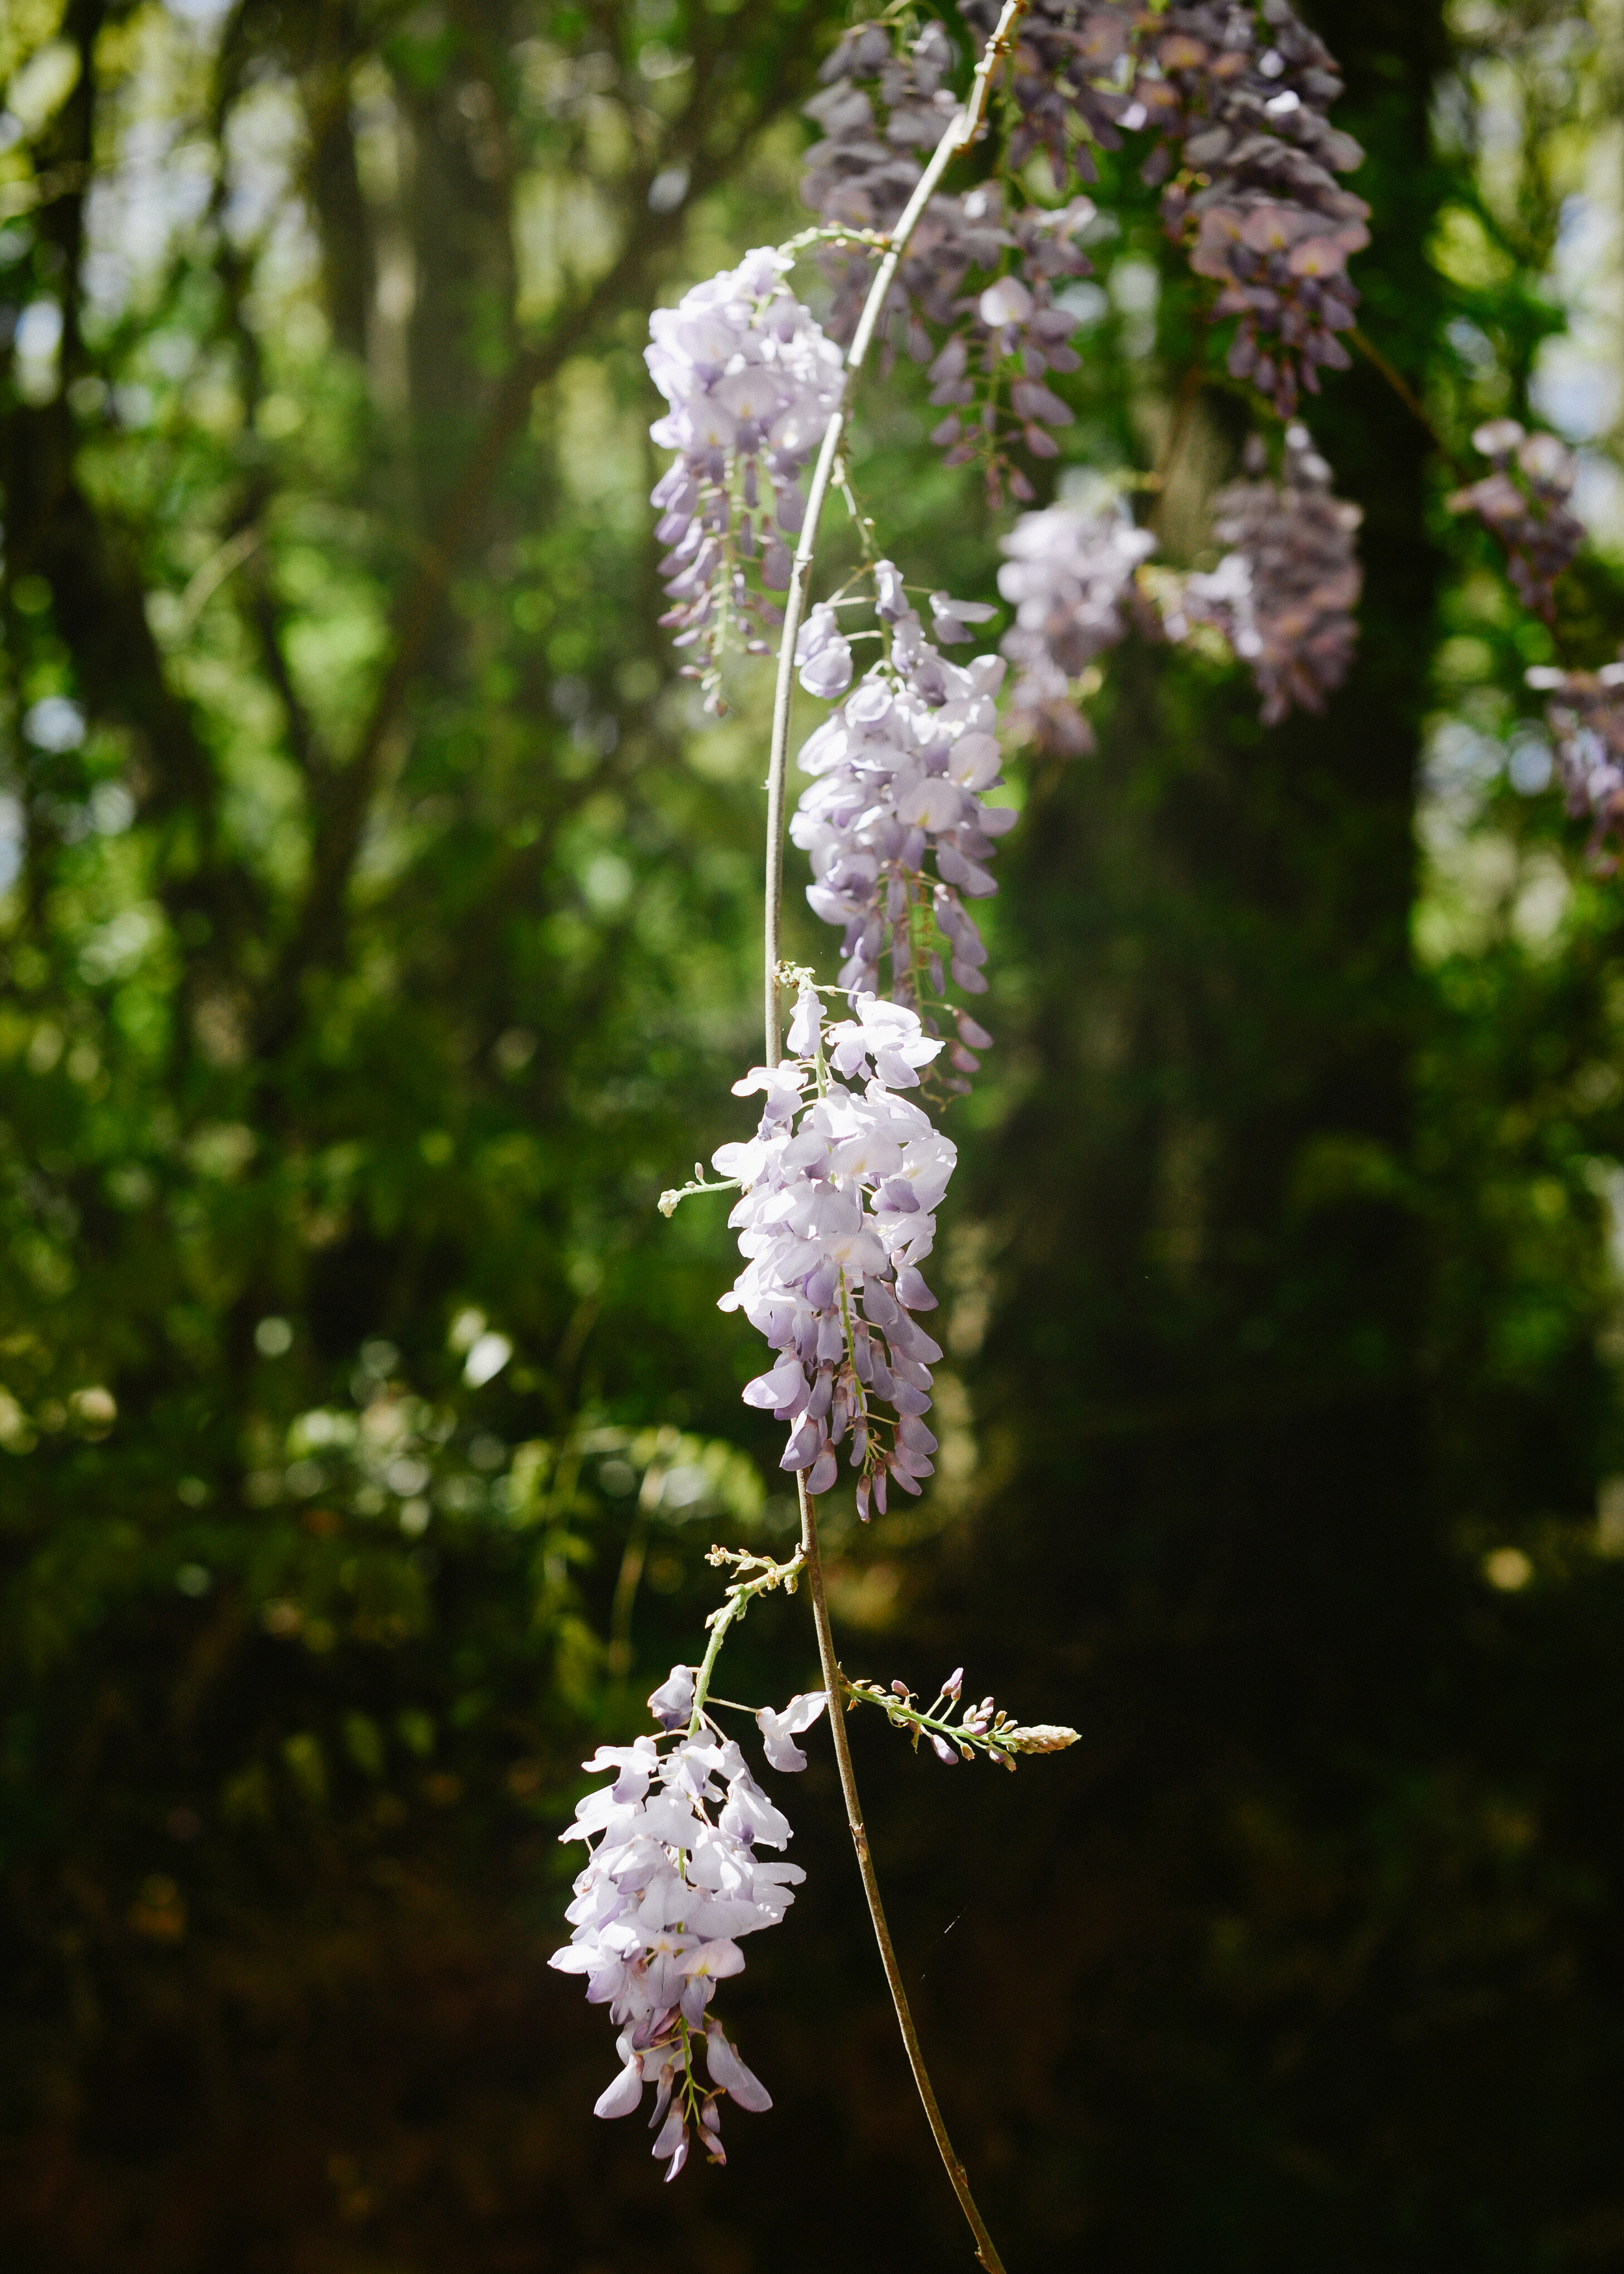 150404_hkp_botanicalgardens046.jpg